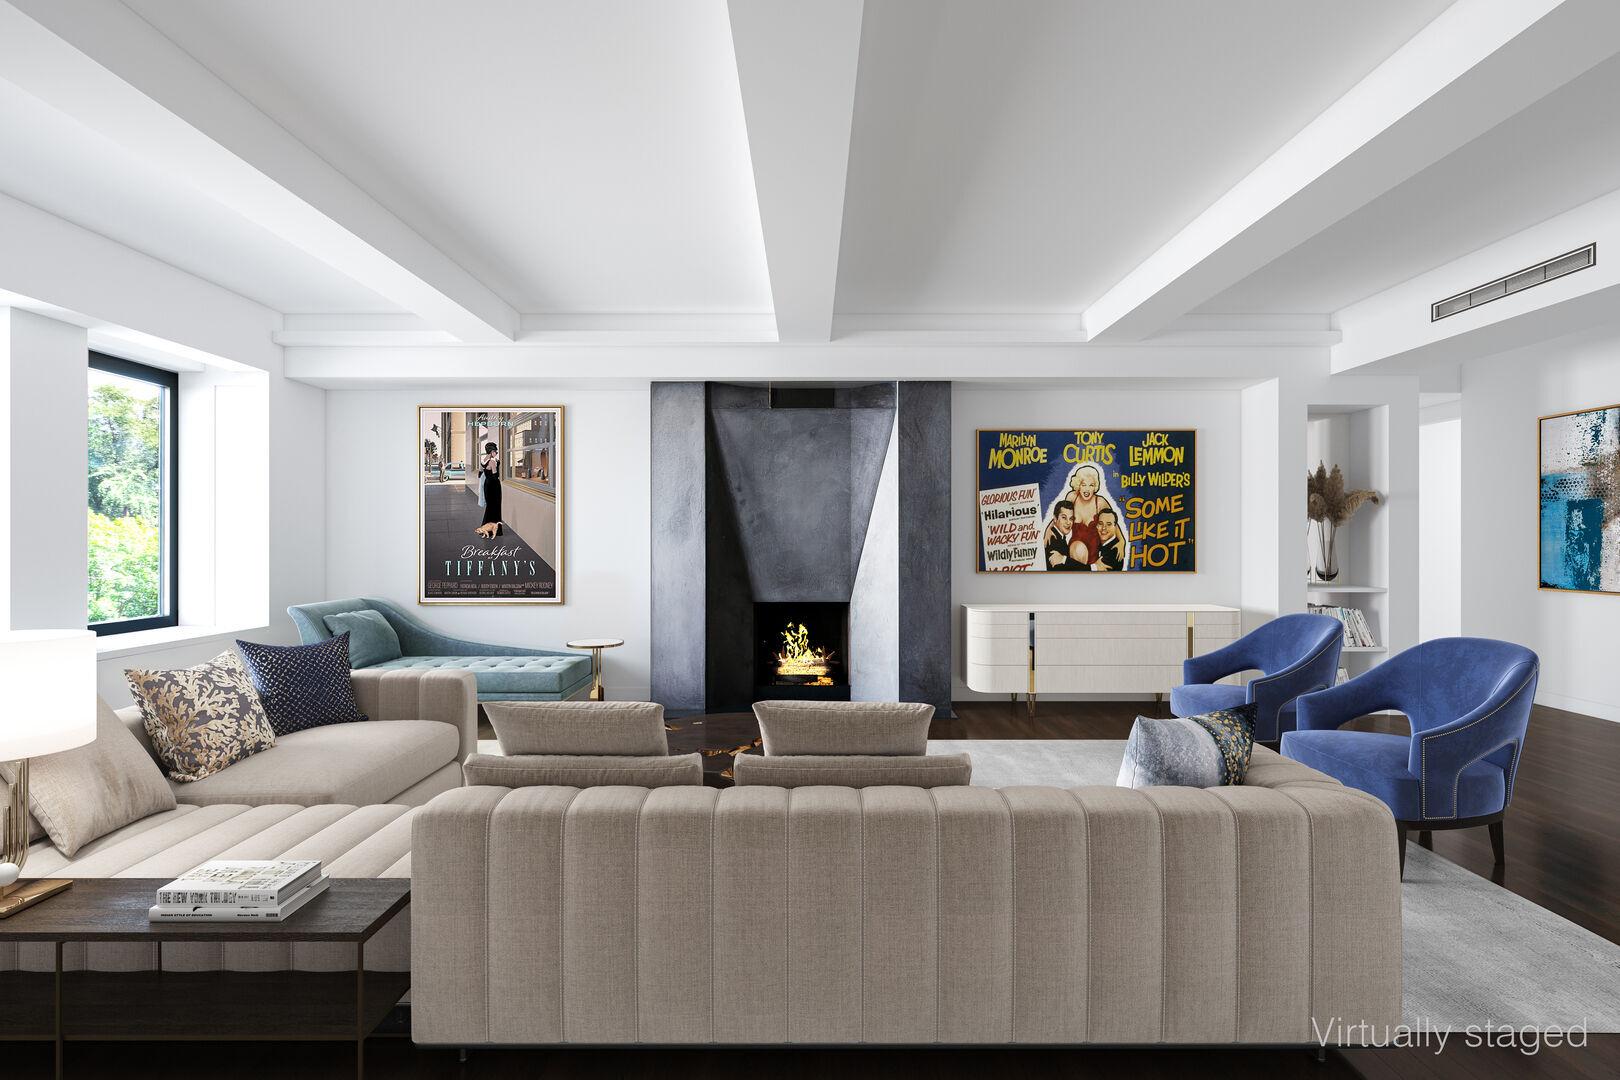 Apartment for sale at 239 Central Park West, Apt 6-B